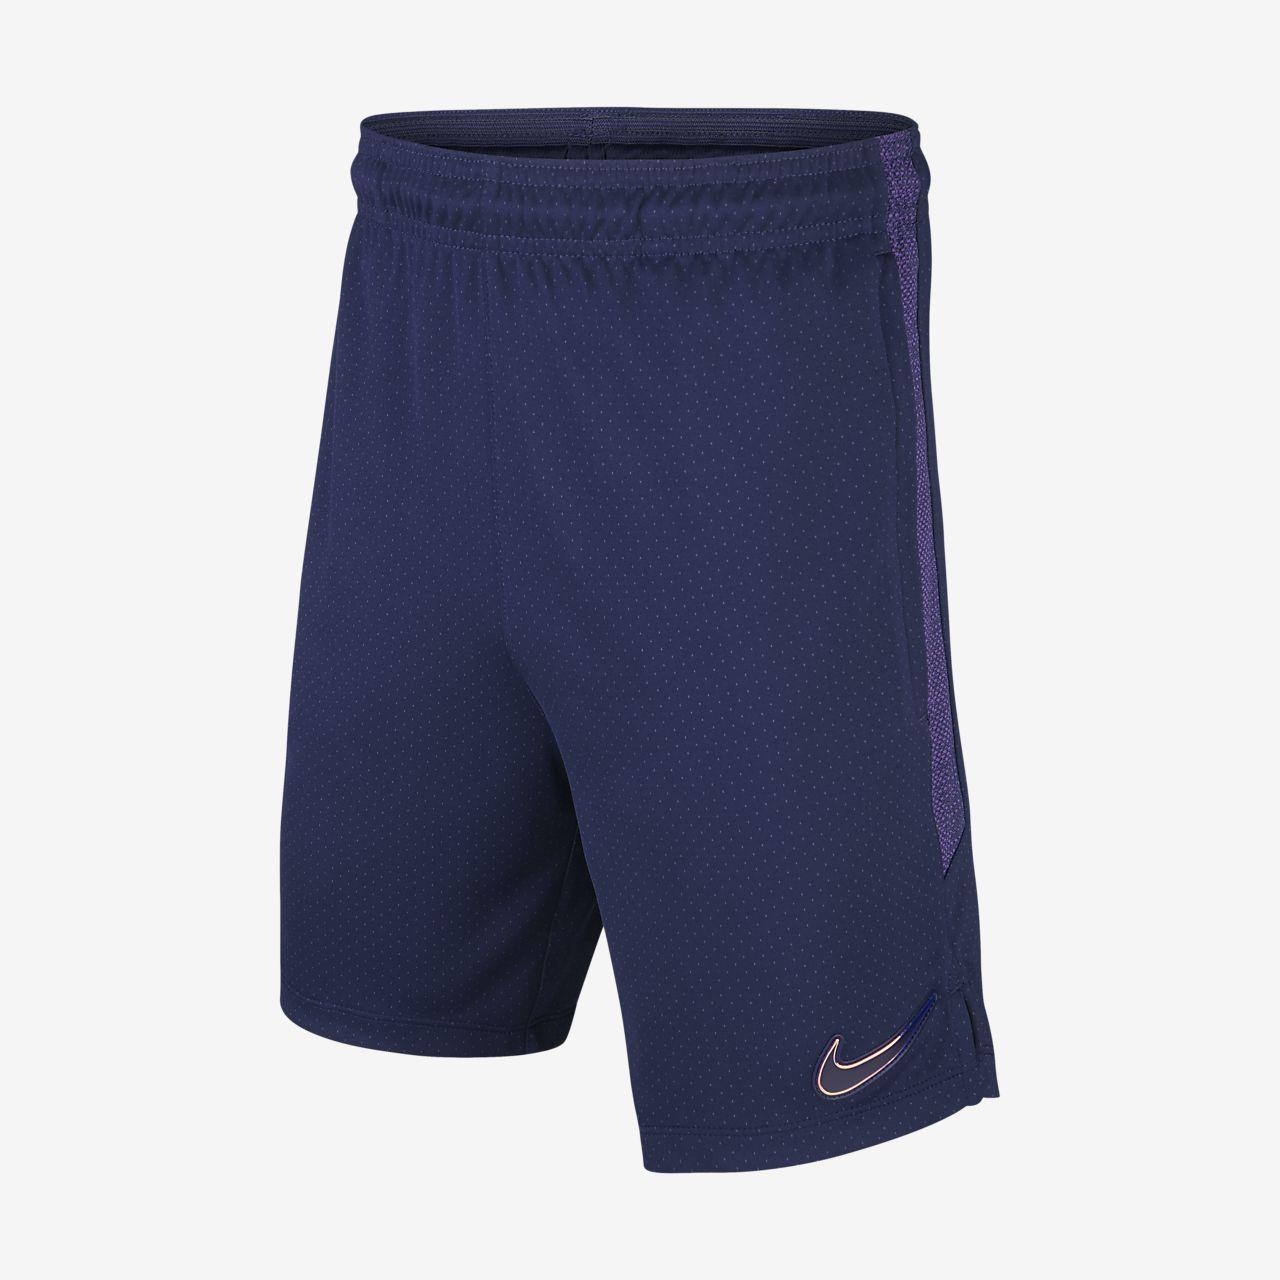 Shorts da calcio Nike Dri-FIT Tottenham Hotspur Strike - Ragazzi